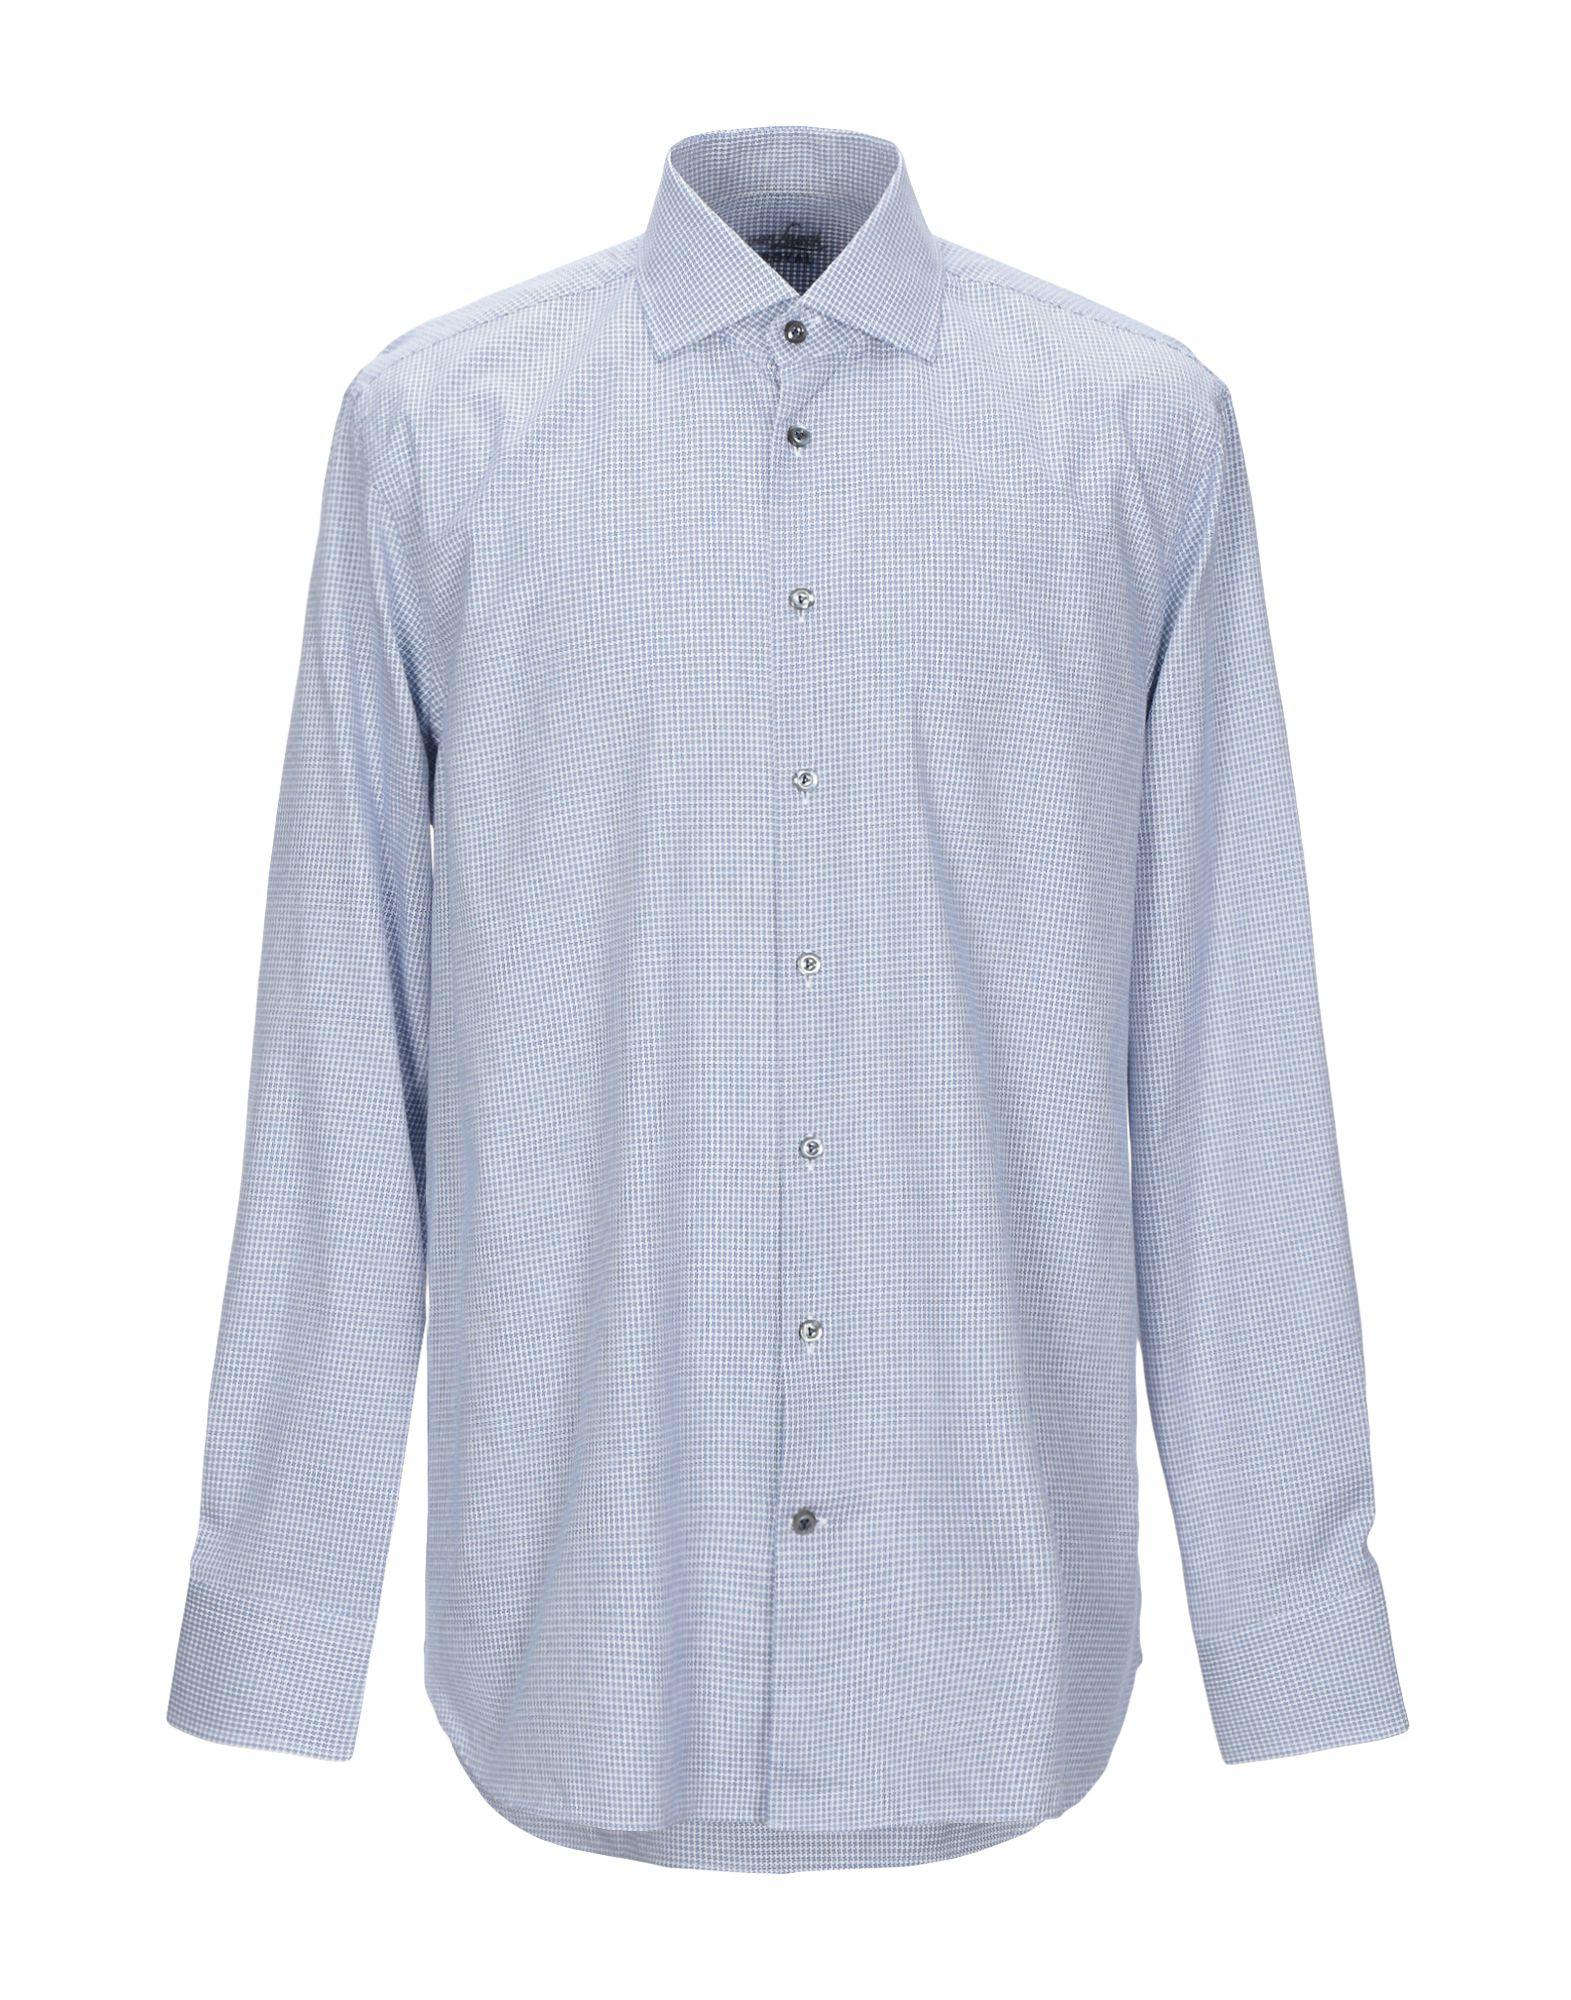 VAN LAACK Pубашка все цены